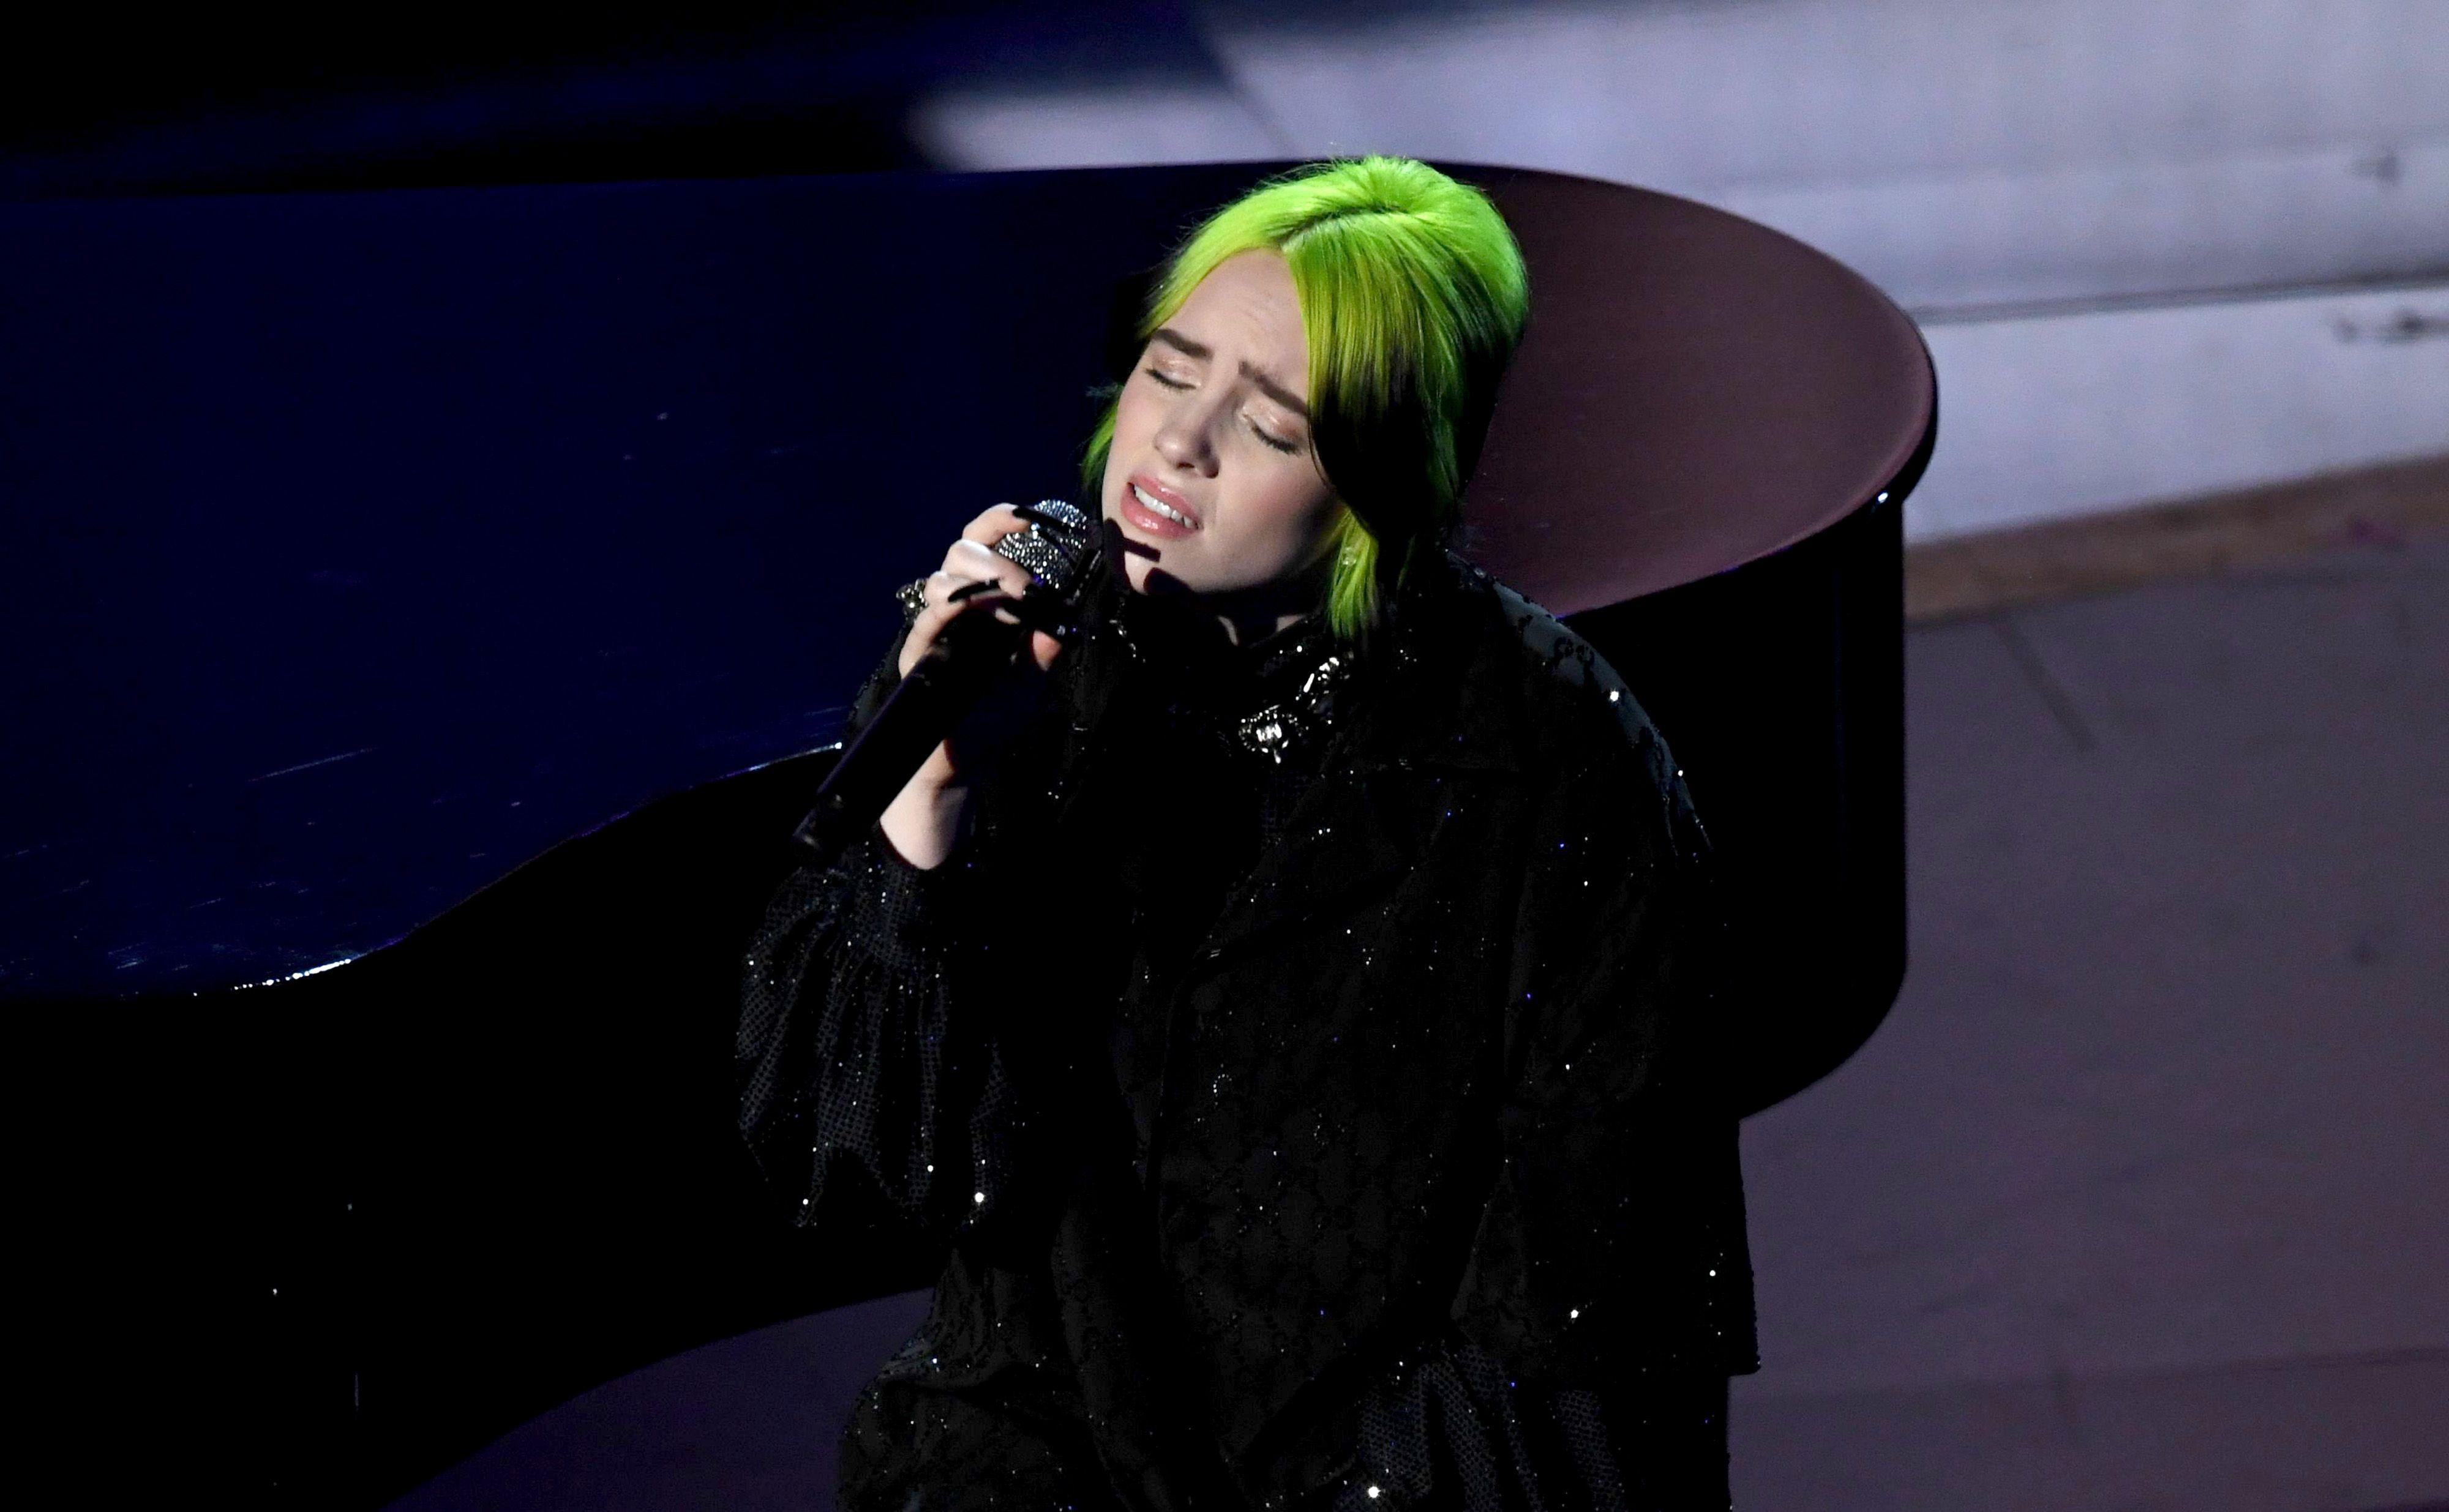 Billie Eilish singing on stage.